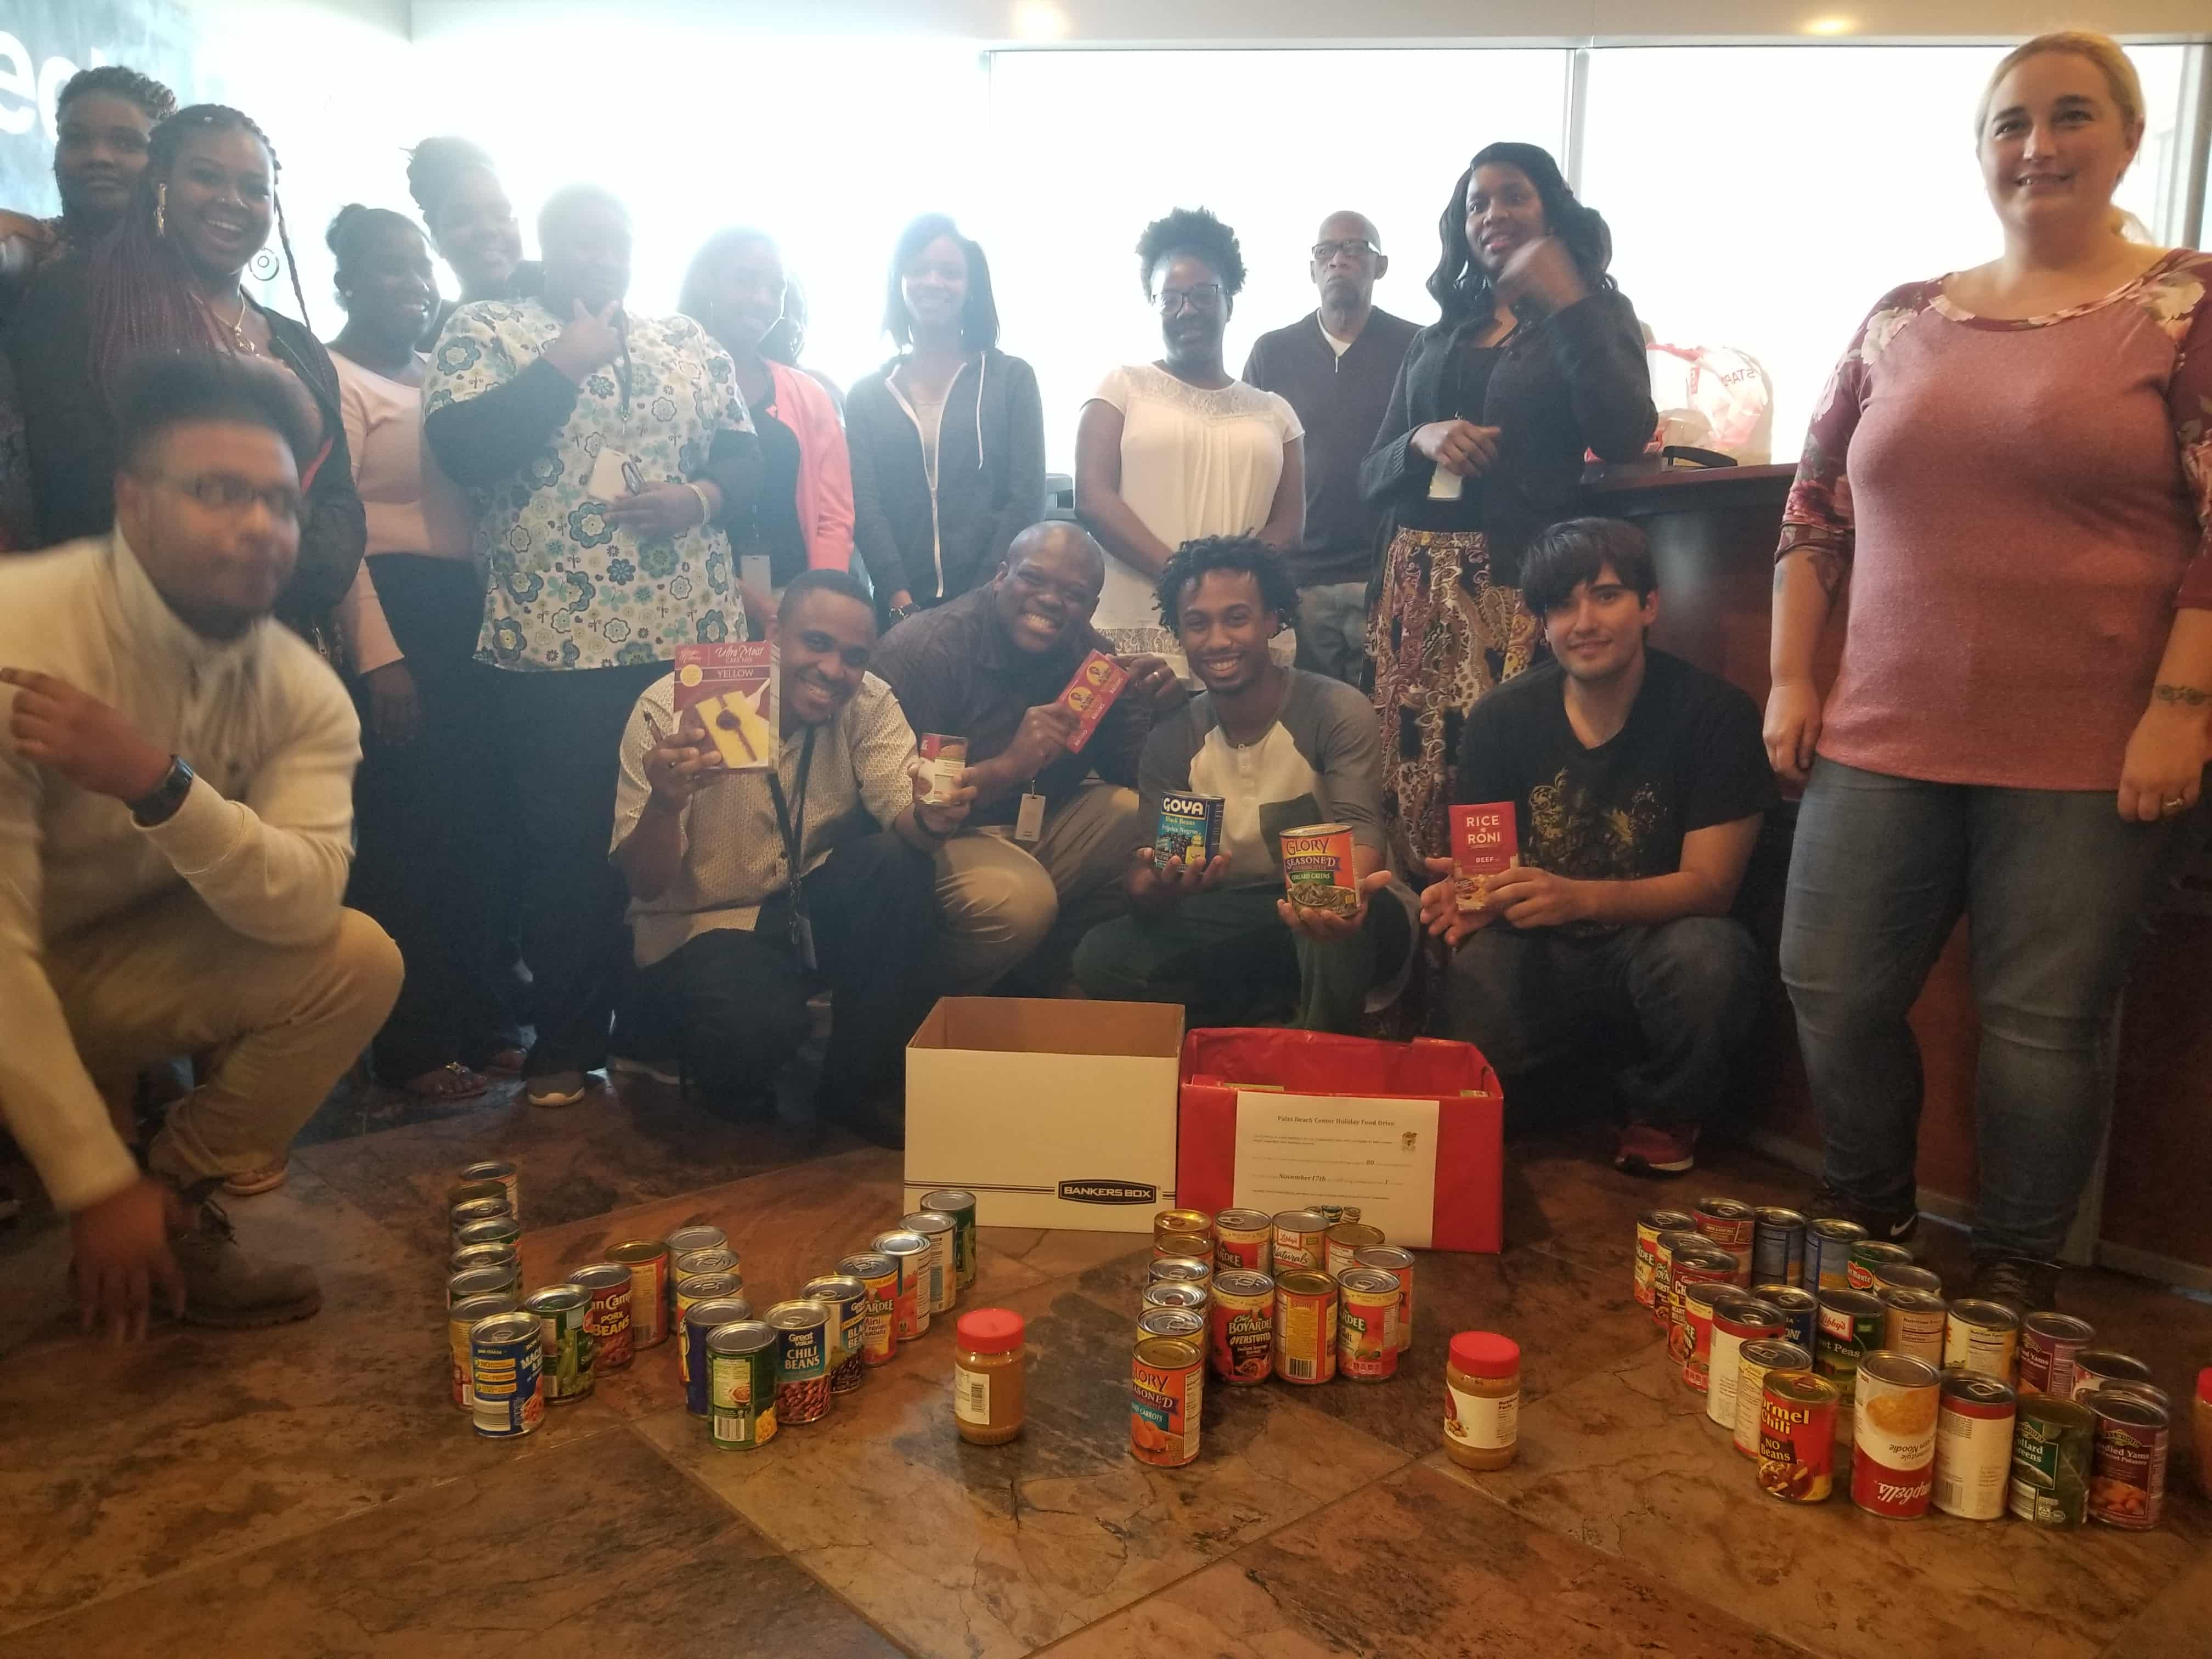 Etech Give Back Program – Palm Beach Food Drive